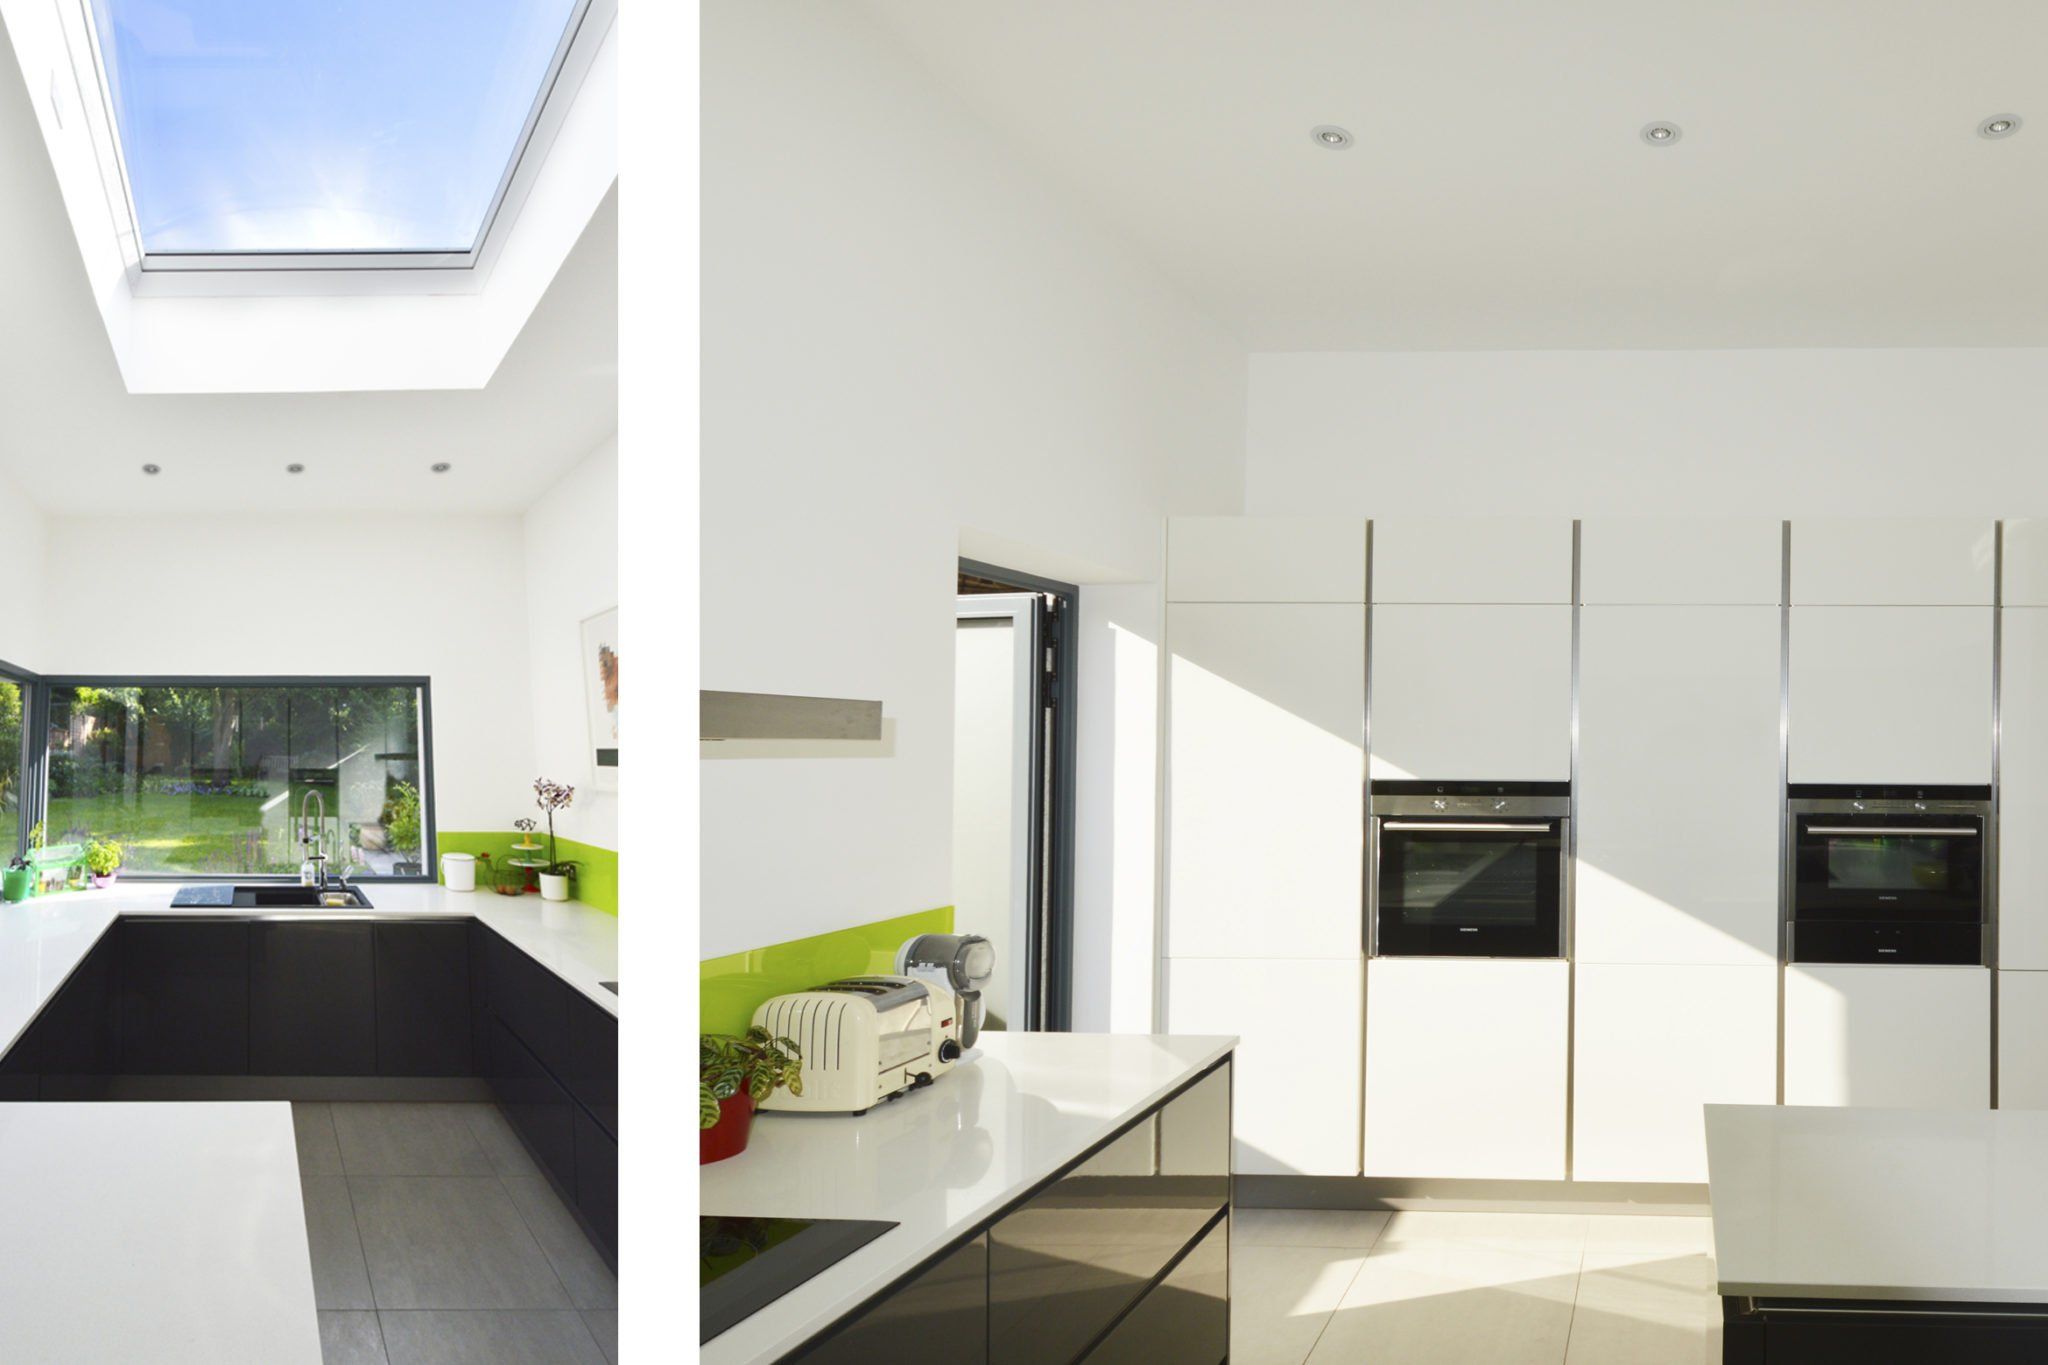 architect-designed-garden-flat-extension-kilburn-brent-nw2-kitchen ...